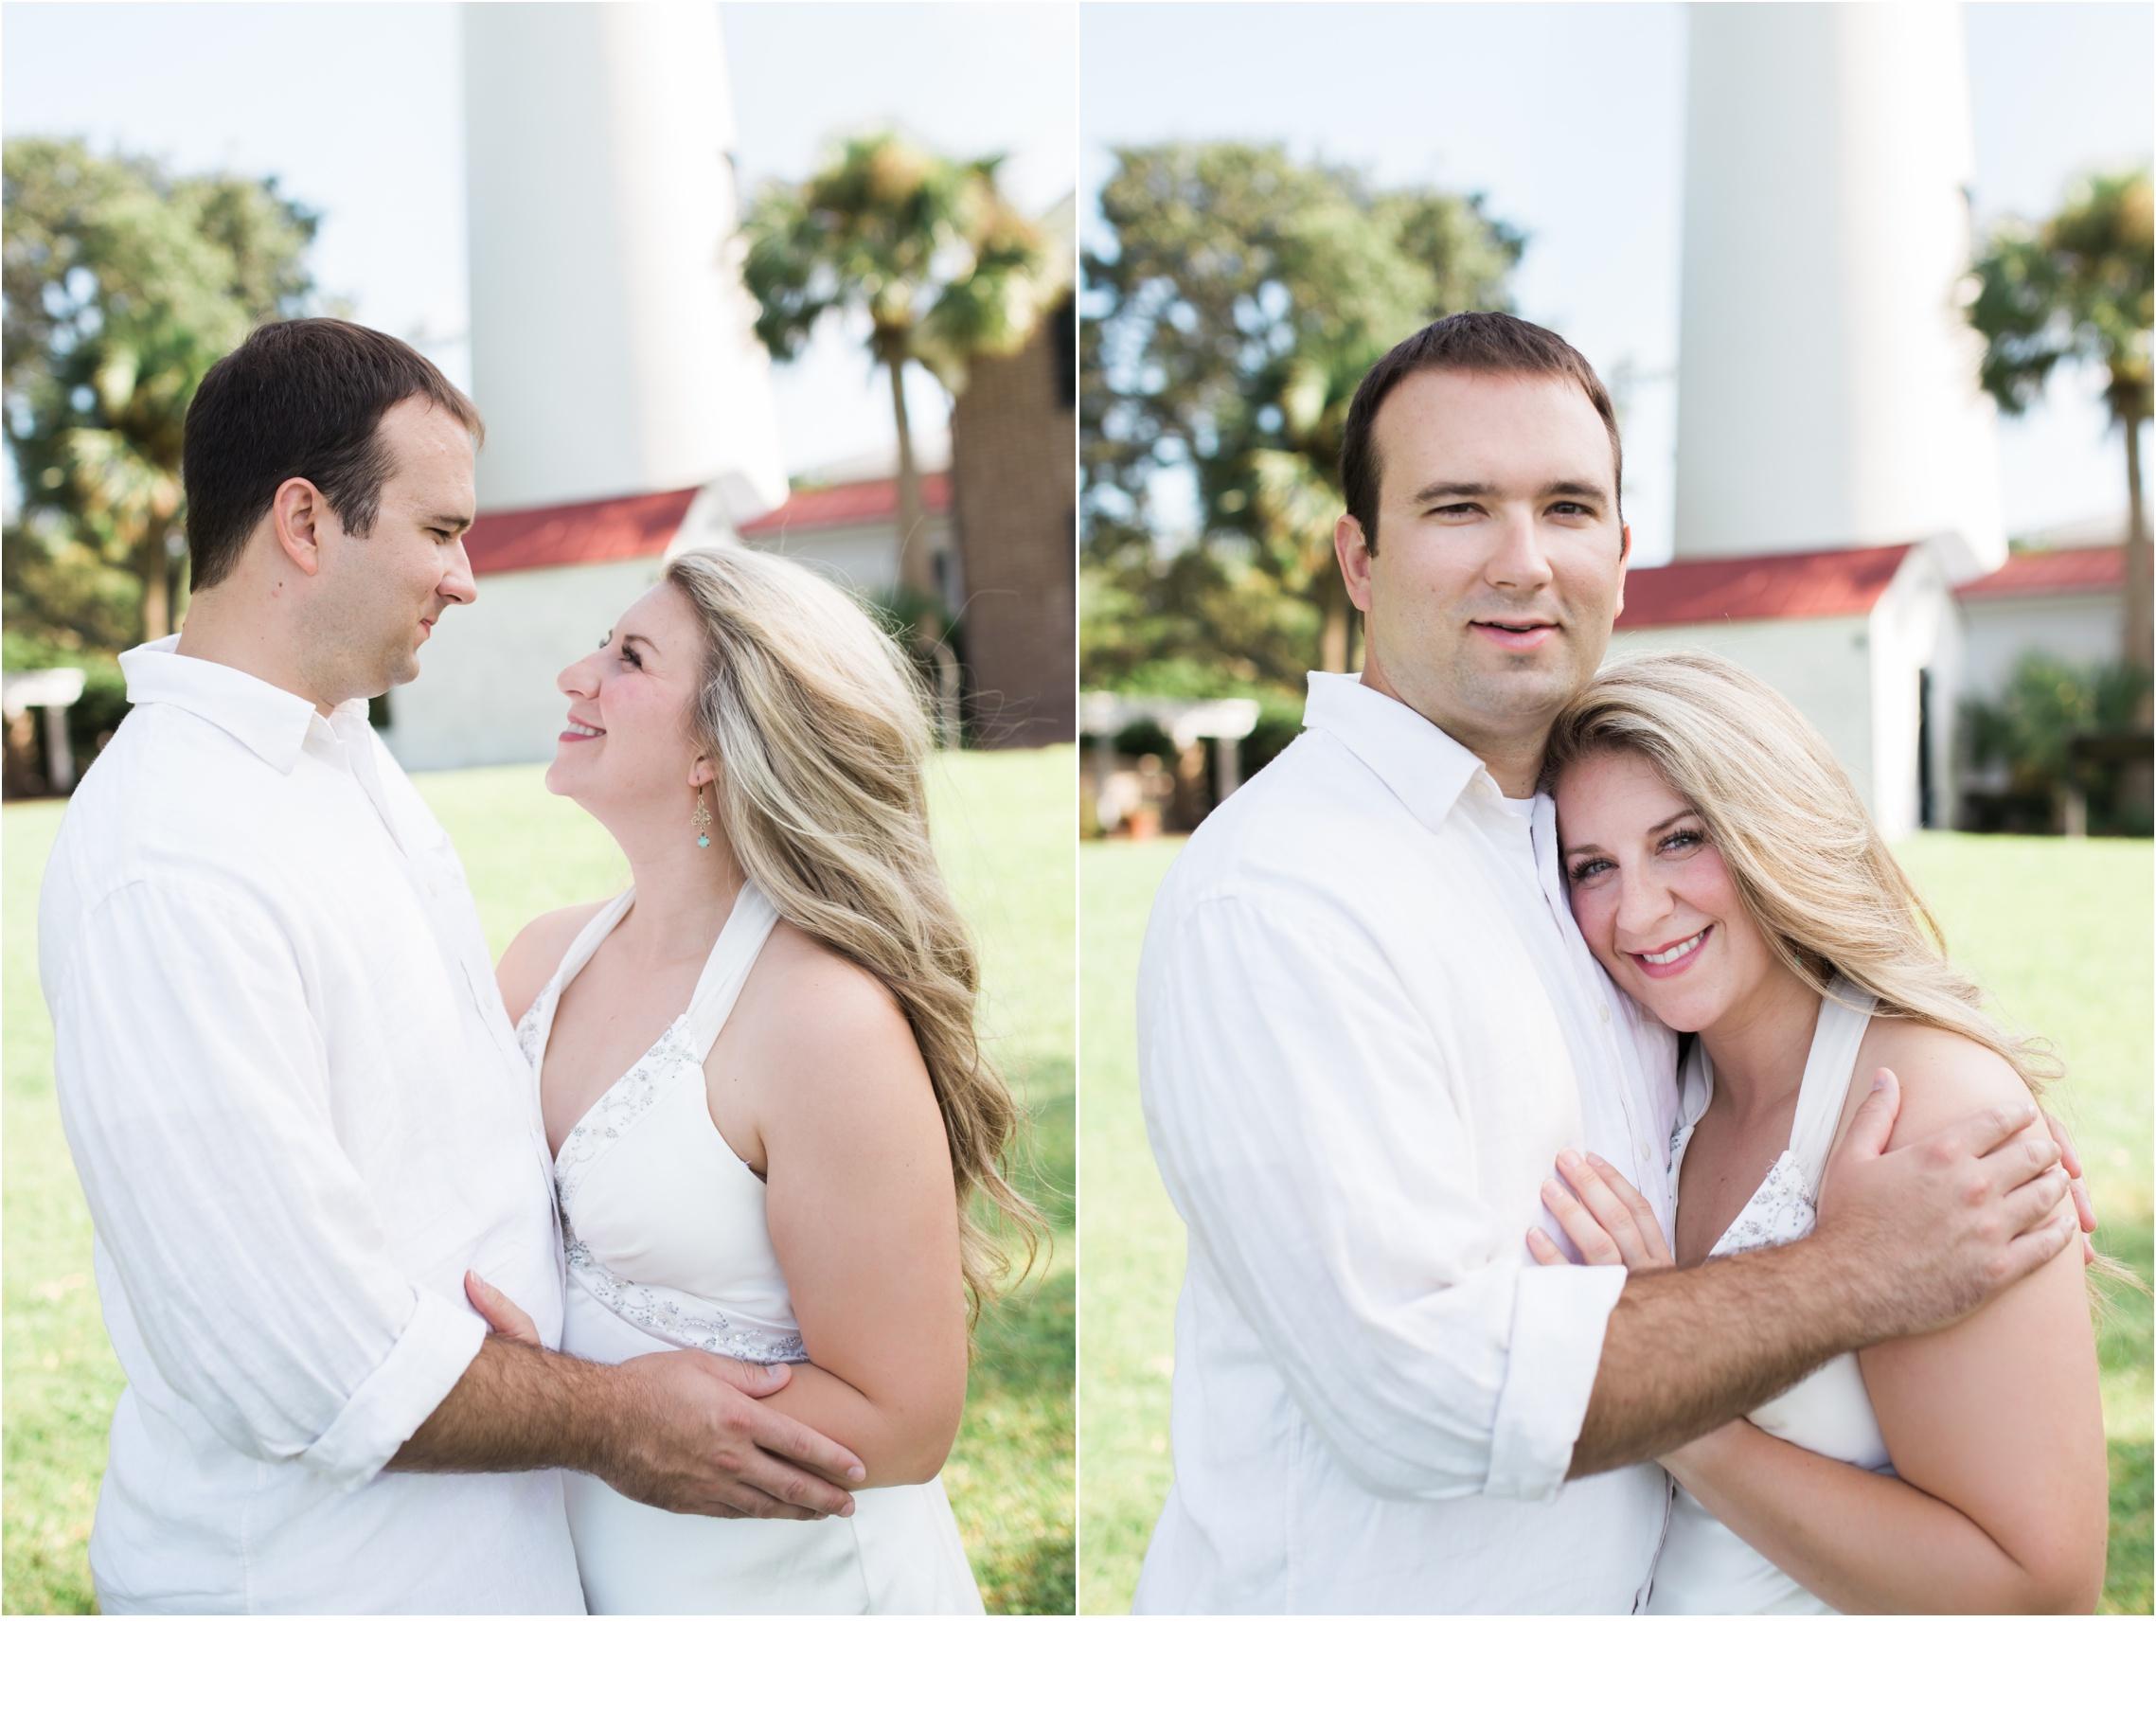 Rainey_Gregg_Photography_St._Simons_Island_Georgia_California_Wedding_Portrait_Photography_0131.jpg